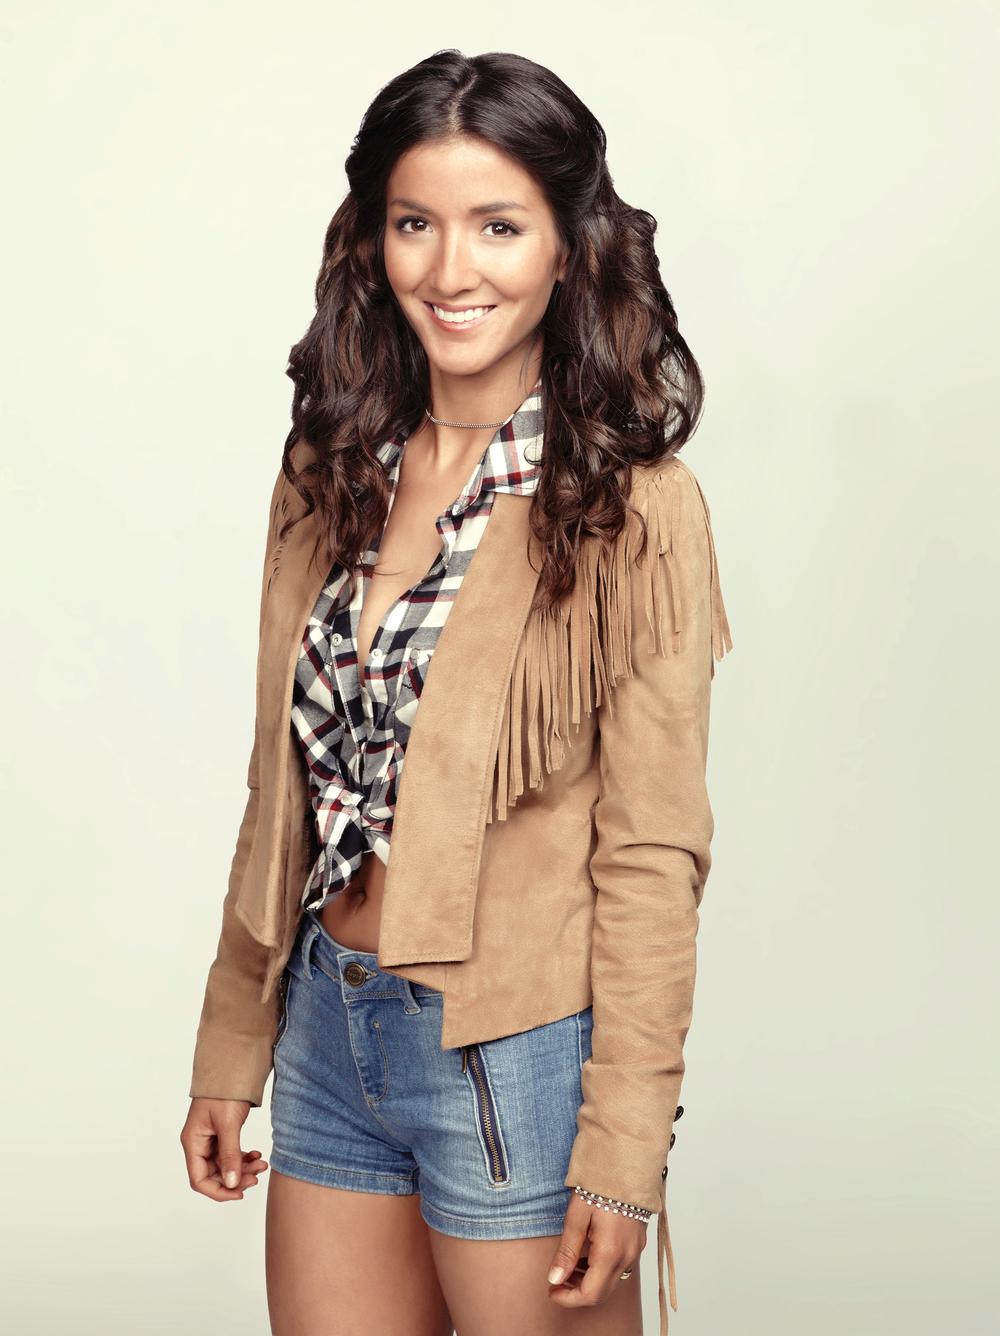 Eréndira Ibarra como Alison Varela_001.jpg